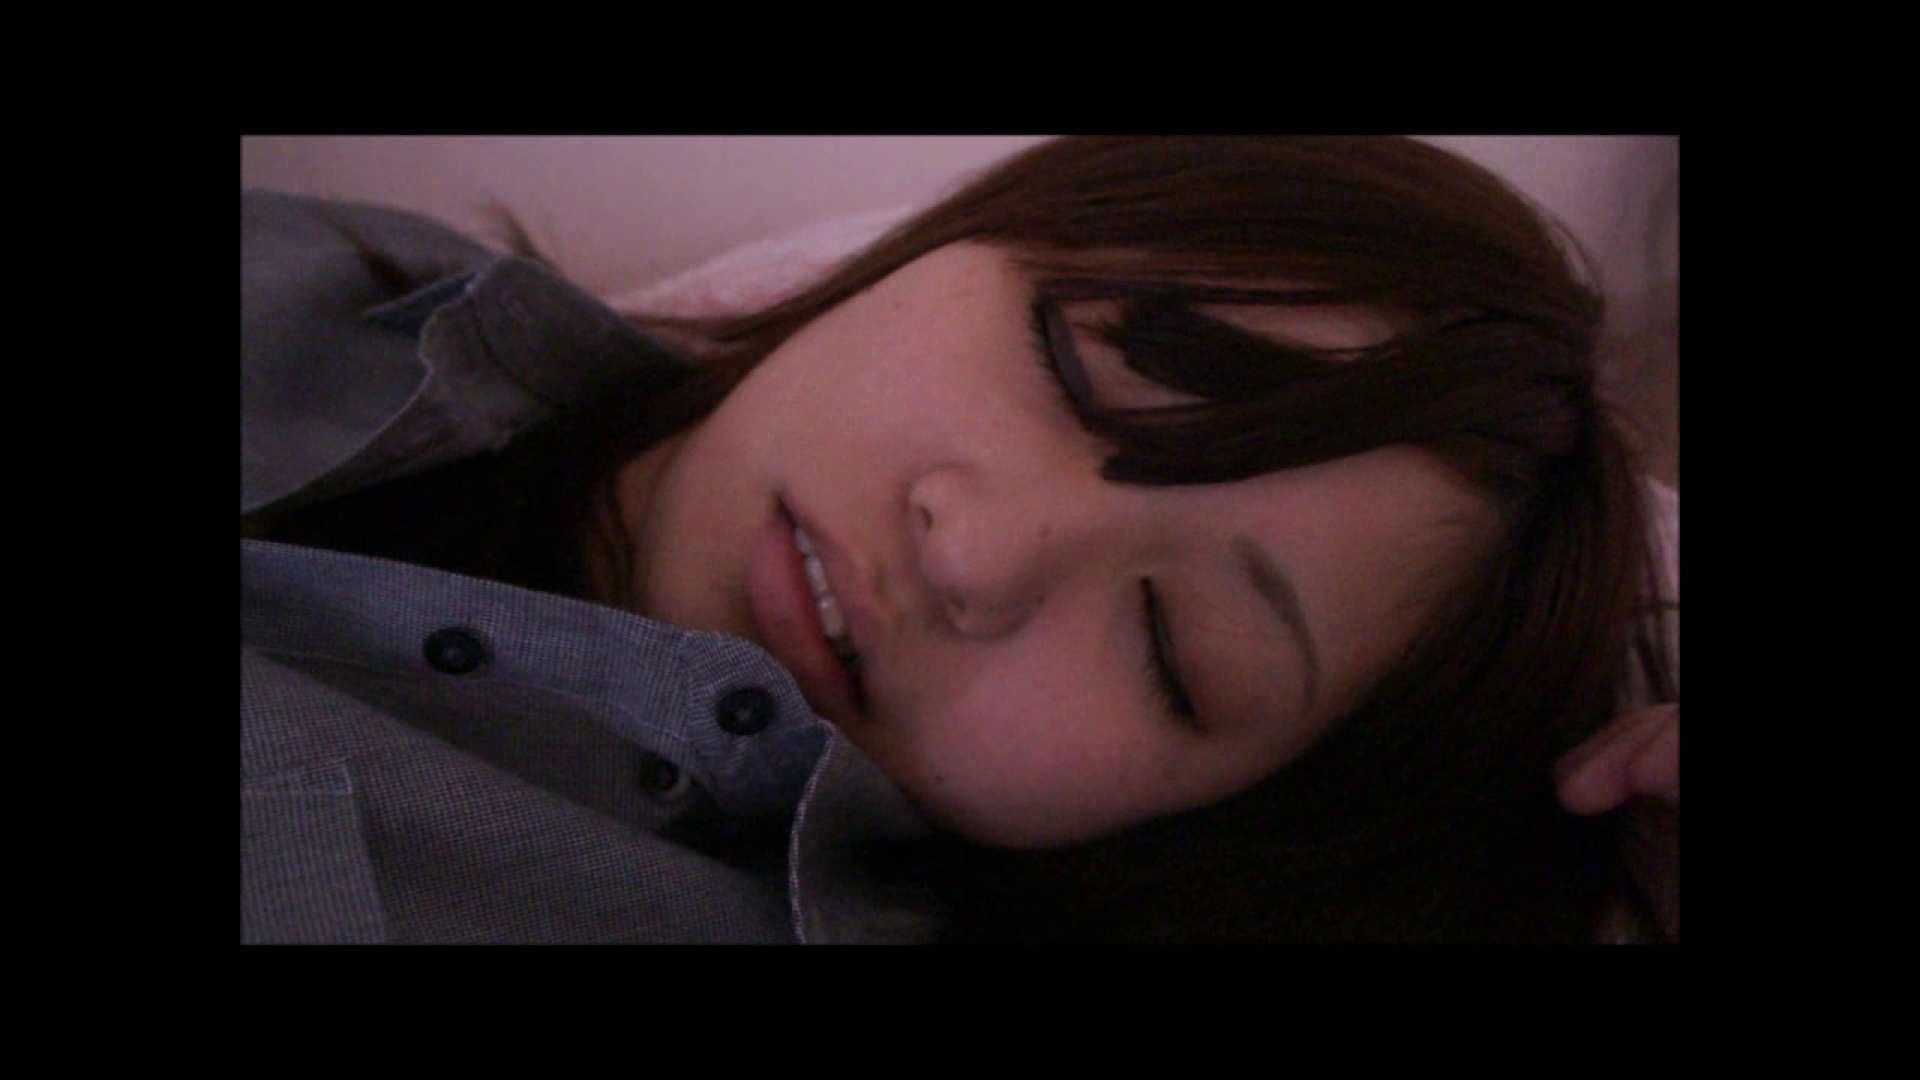 vol.15 友人が抱く葵への感情・・・弄ばれた巨乳。 巨乳 AV動画キャプチャ 76画像 26